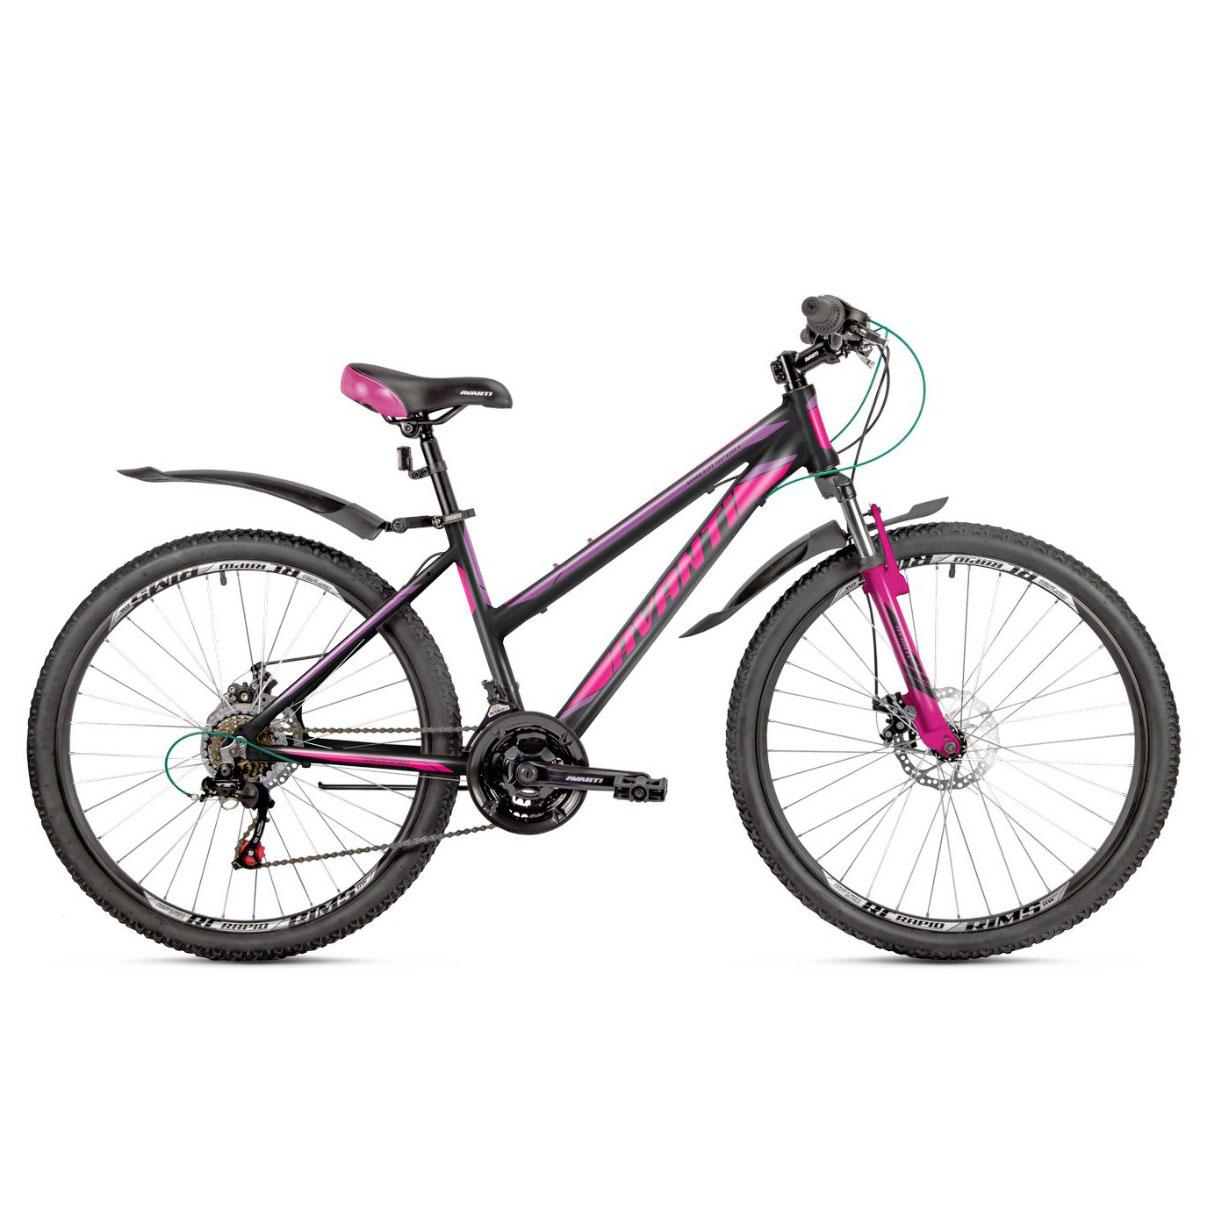 Фото Женский Велосипед  26 Avanti Omega Sport disk 2018 черно-розовый